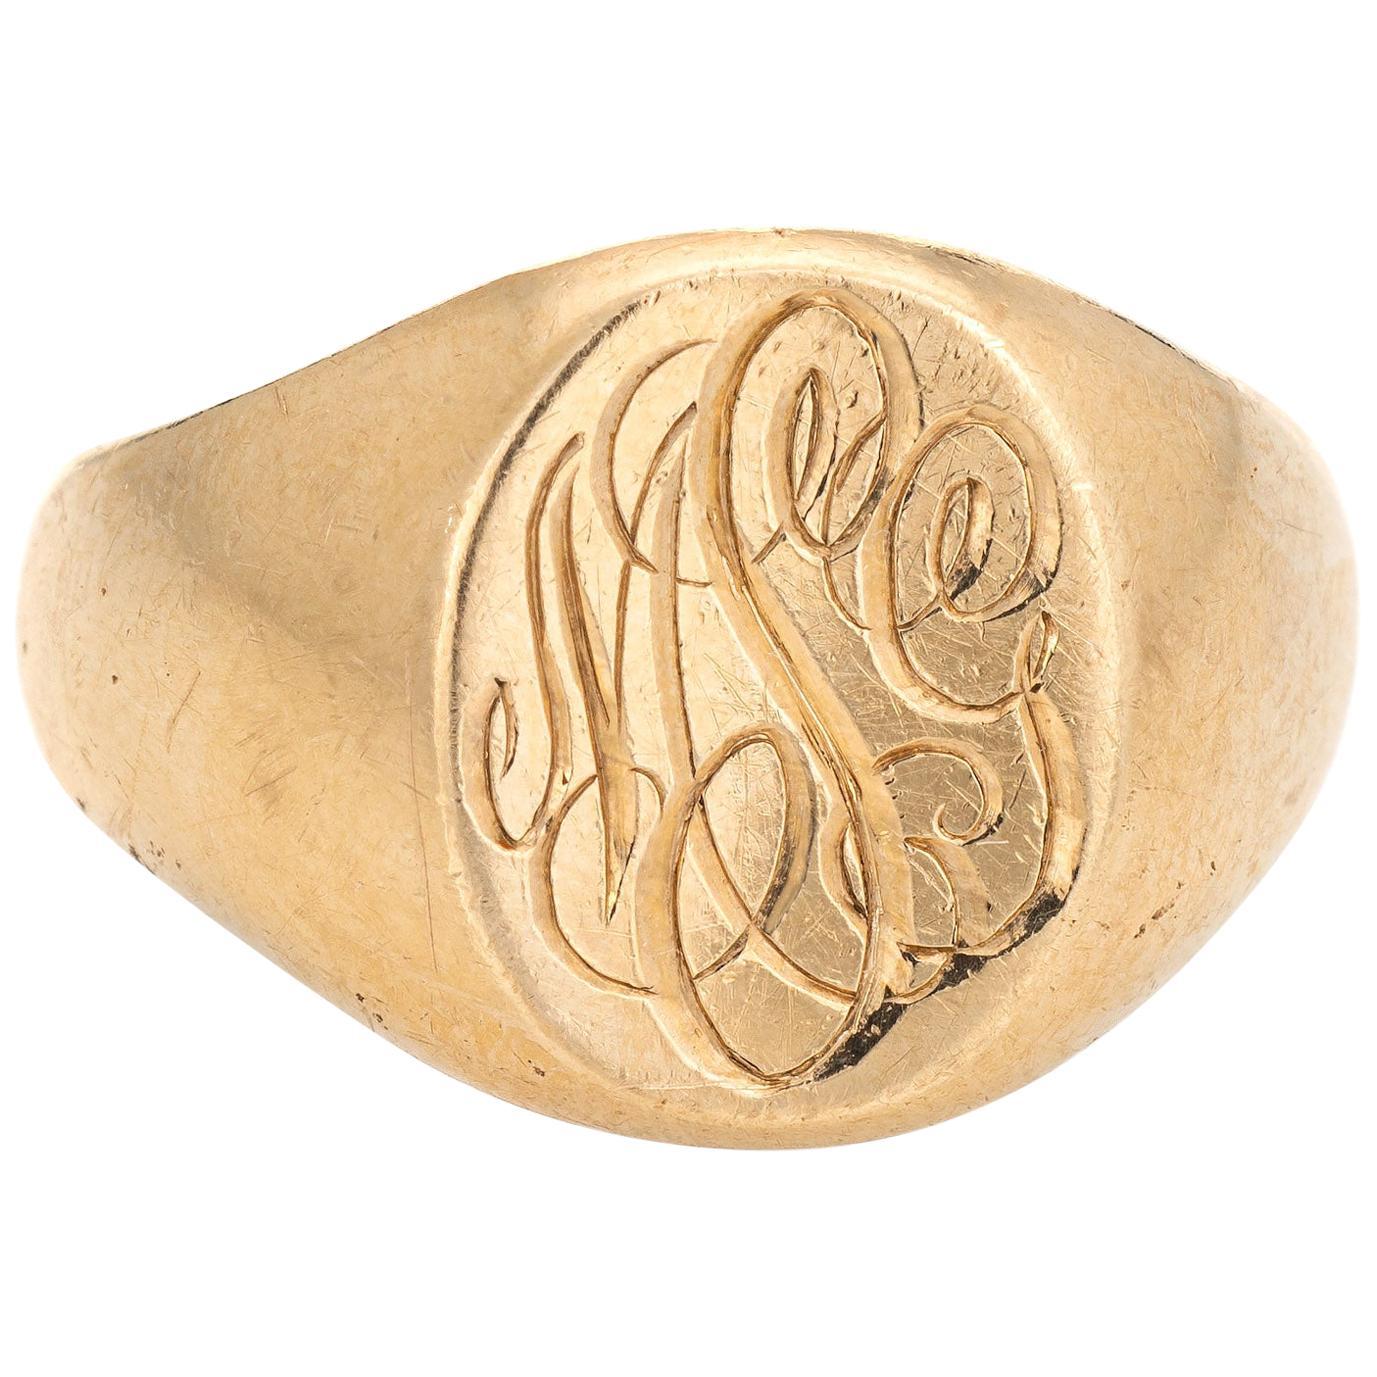 Tiffany & Co. Larter & Sons Signet Ring Vintage 14 Karat Yellow Gold Jewelry